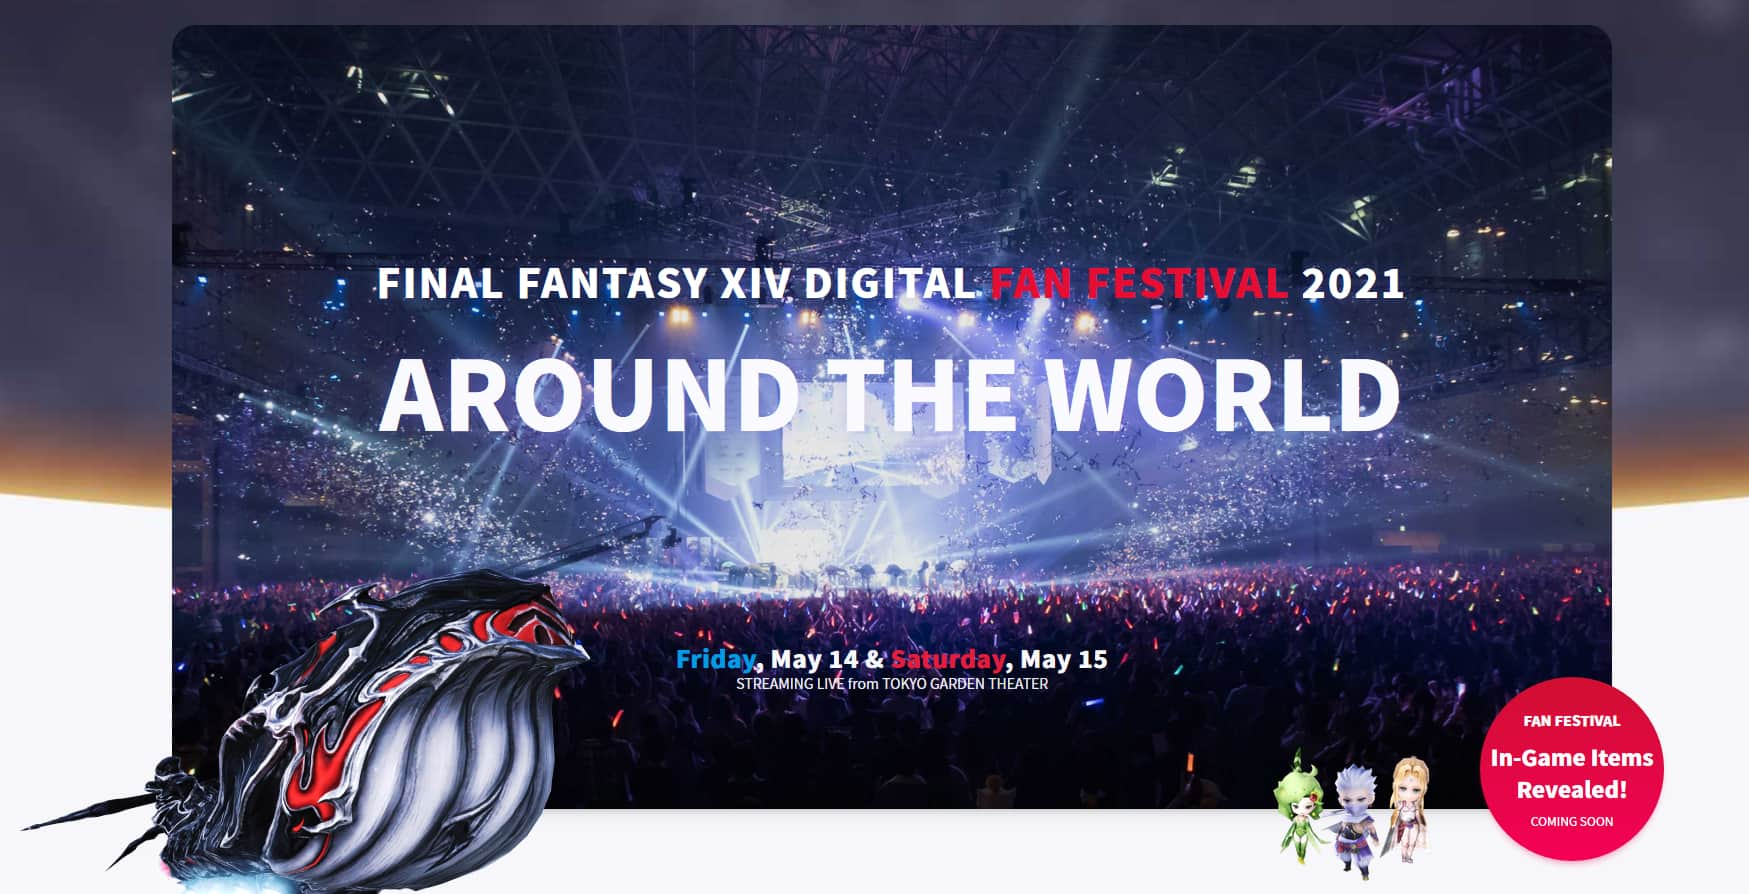 Final Fantasy XIV Digital Fanfest Kicks Off May 14th 7